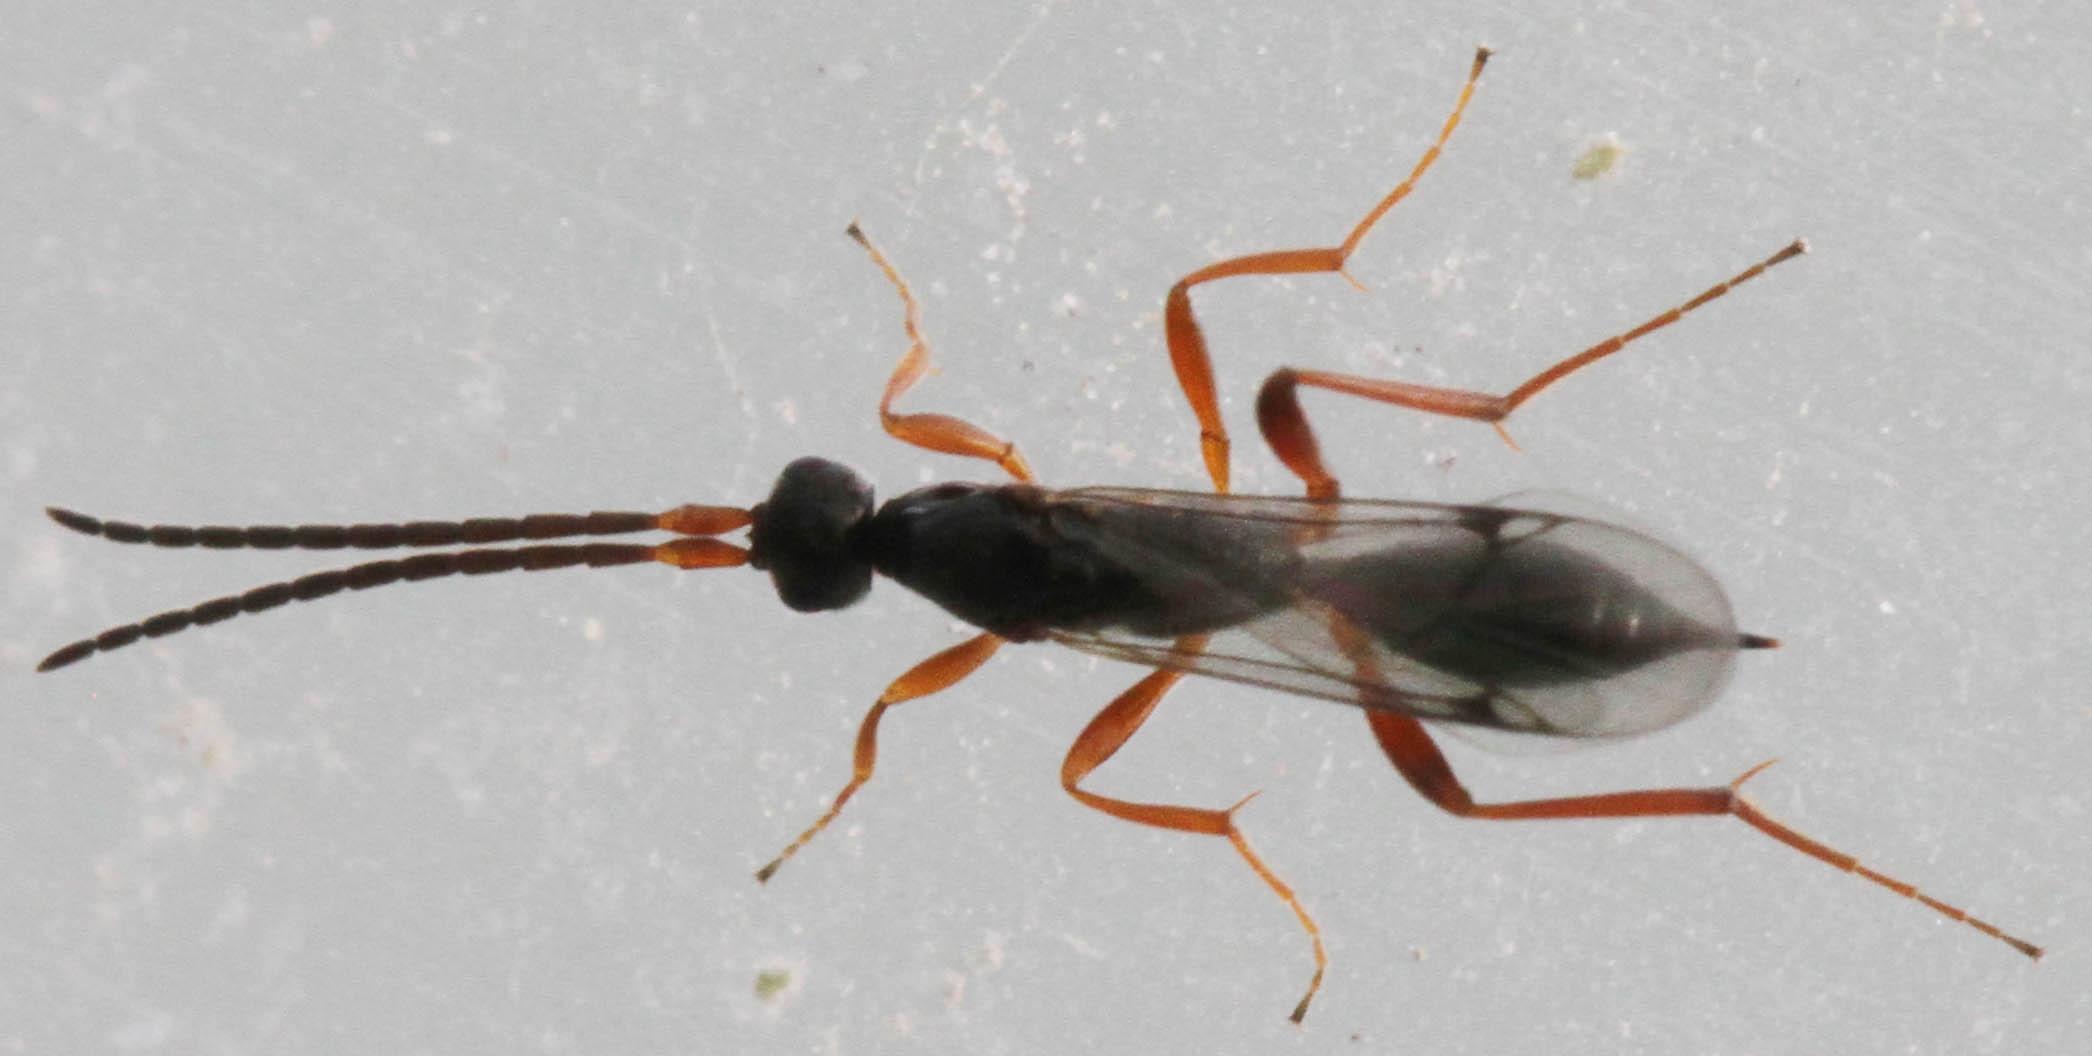 Phaneroserphus calcar (Phaneroserphus calcar)